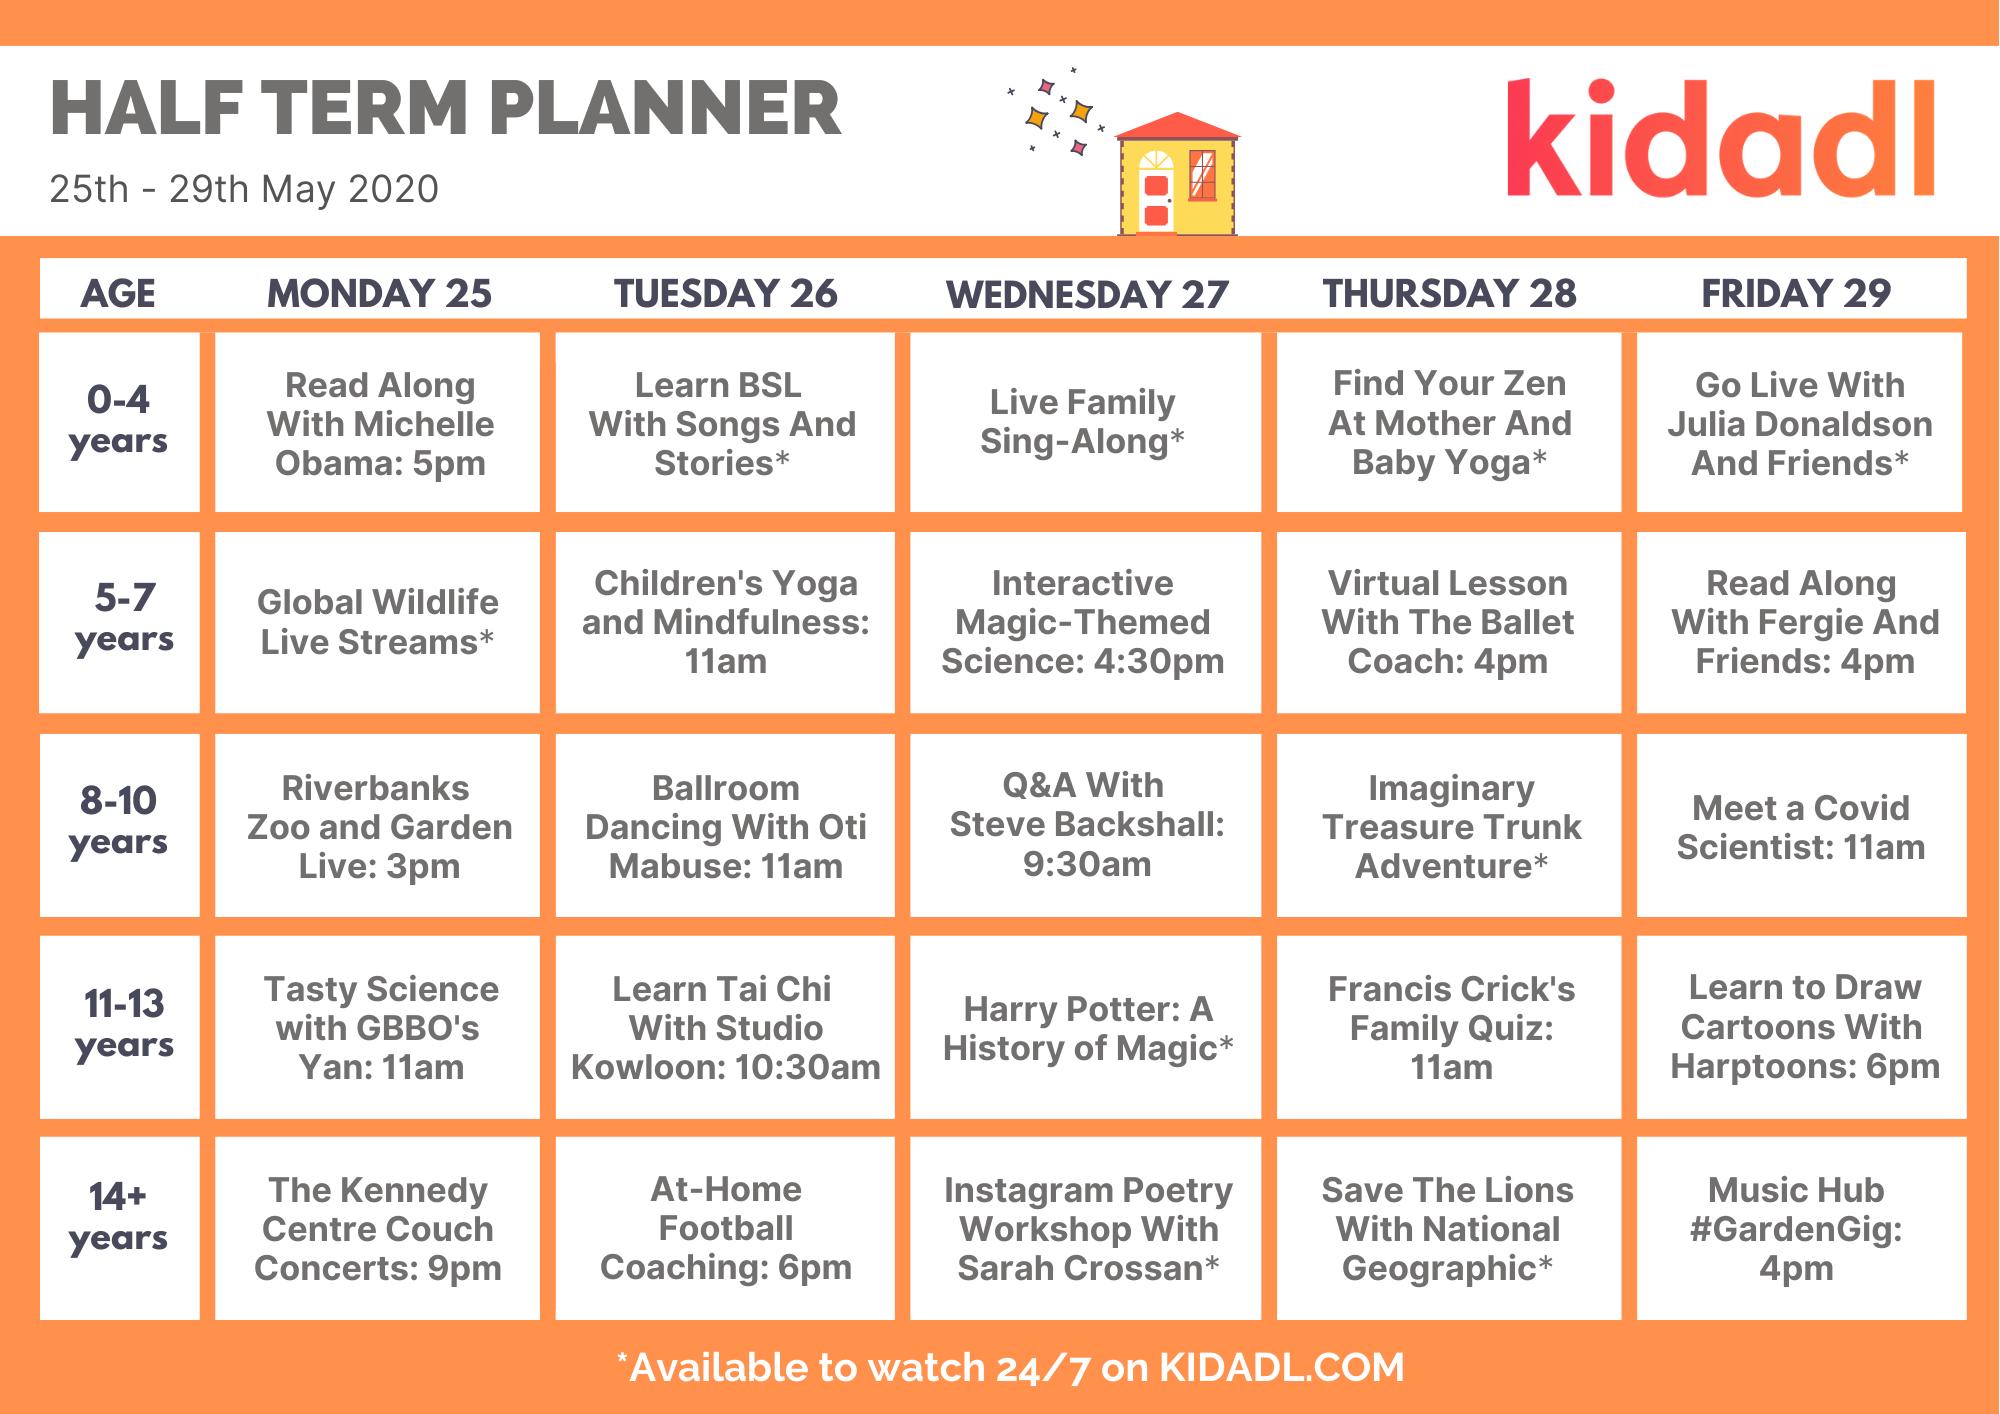 half term planner